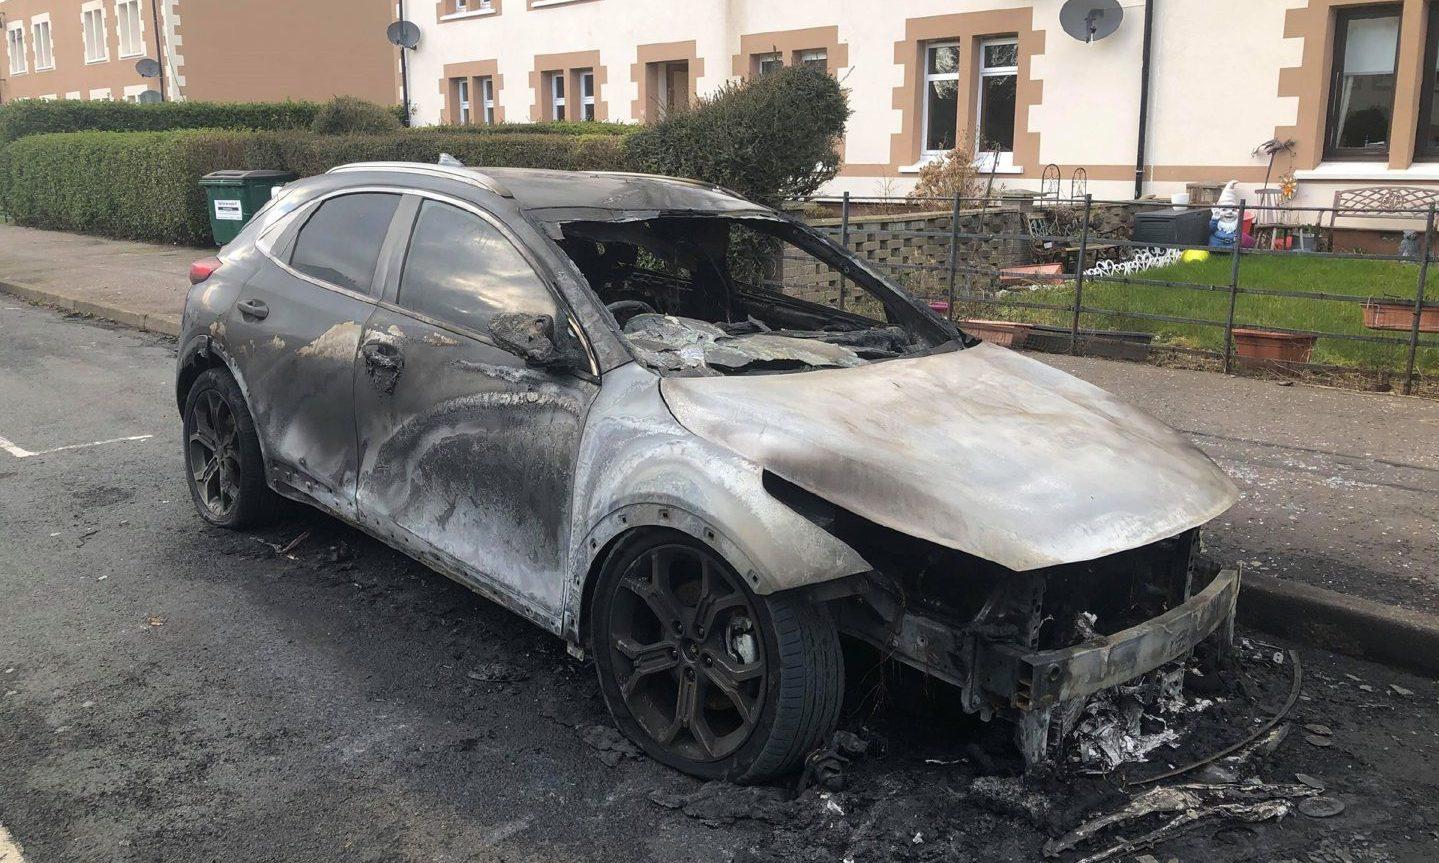 Car destroyed on Strathmore Street.